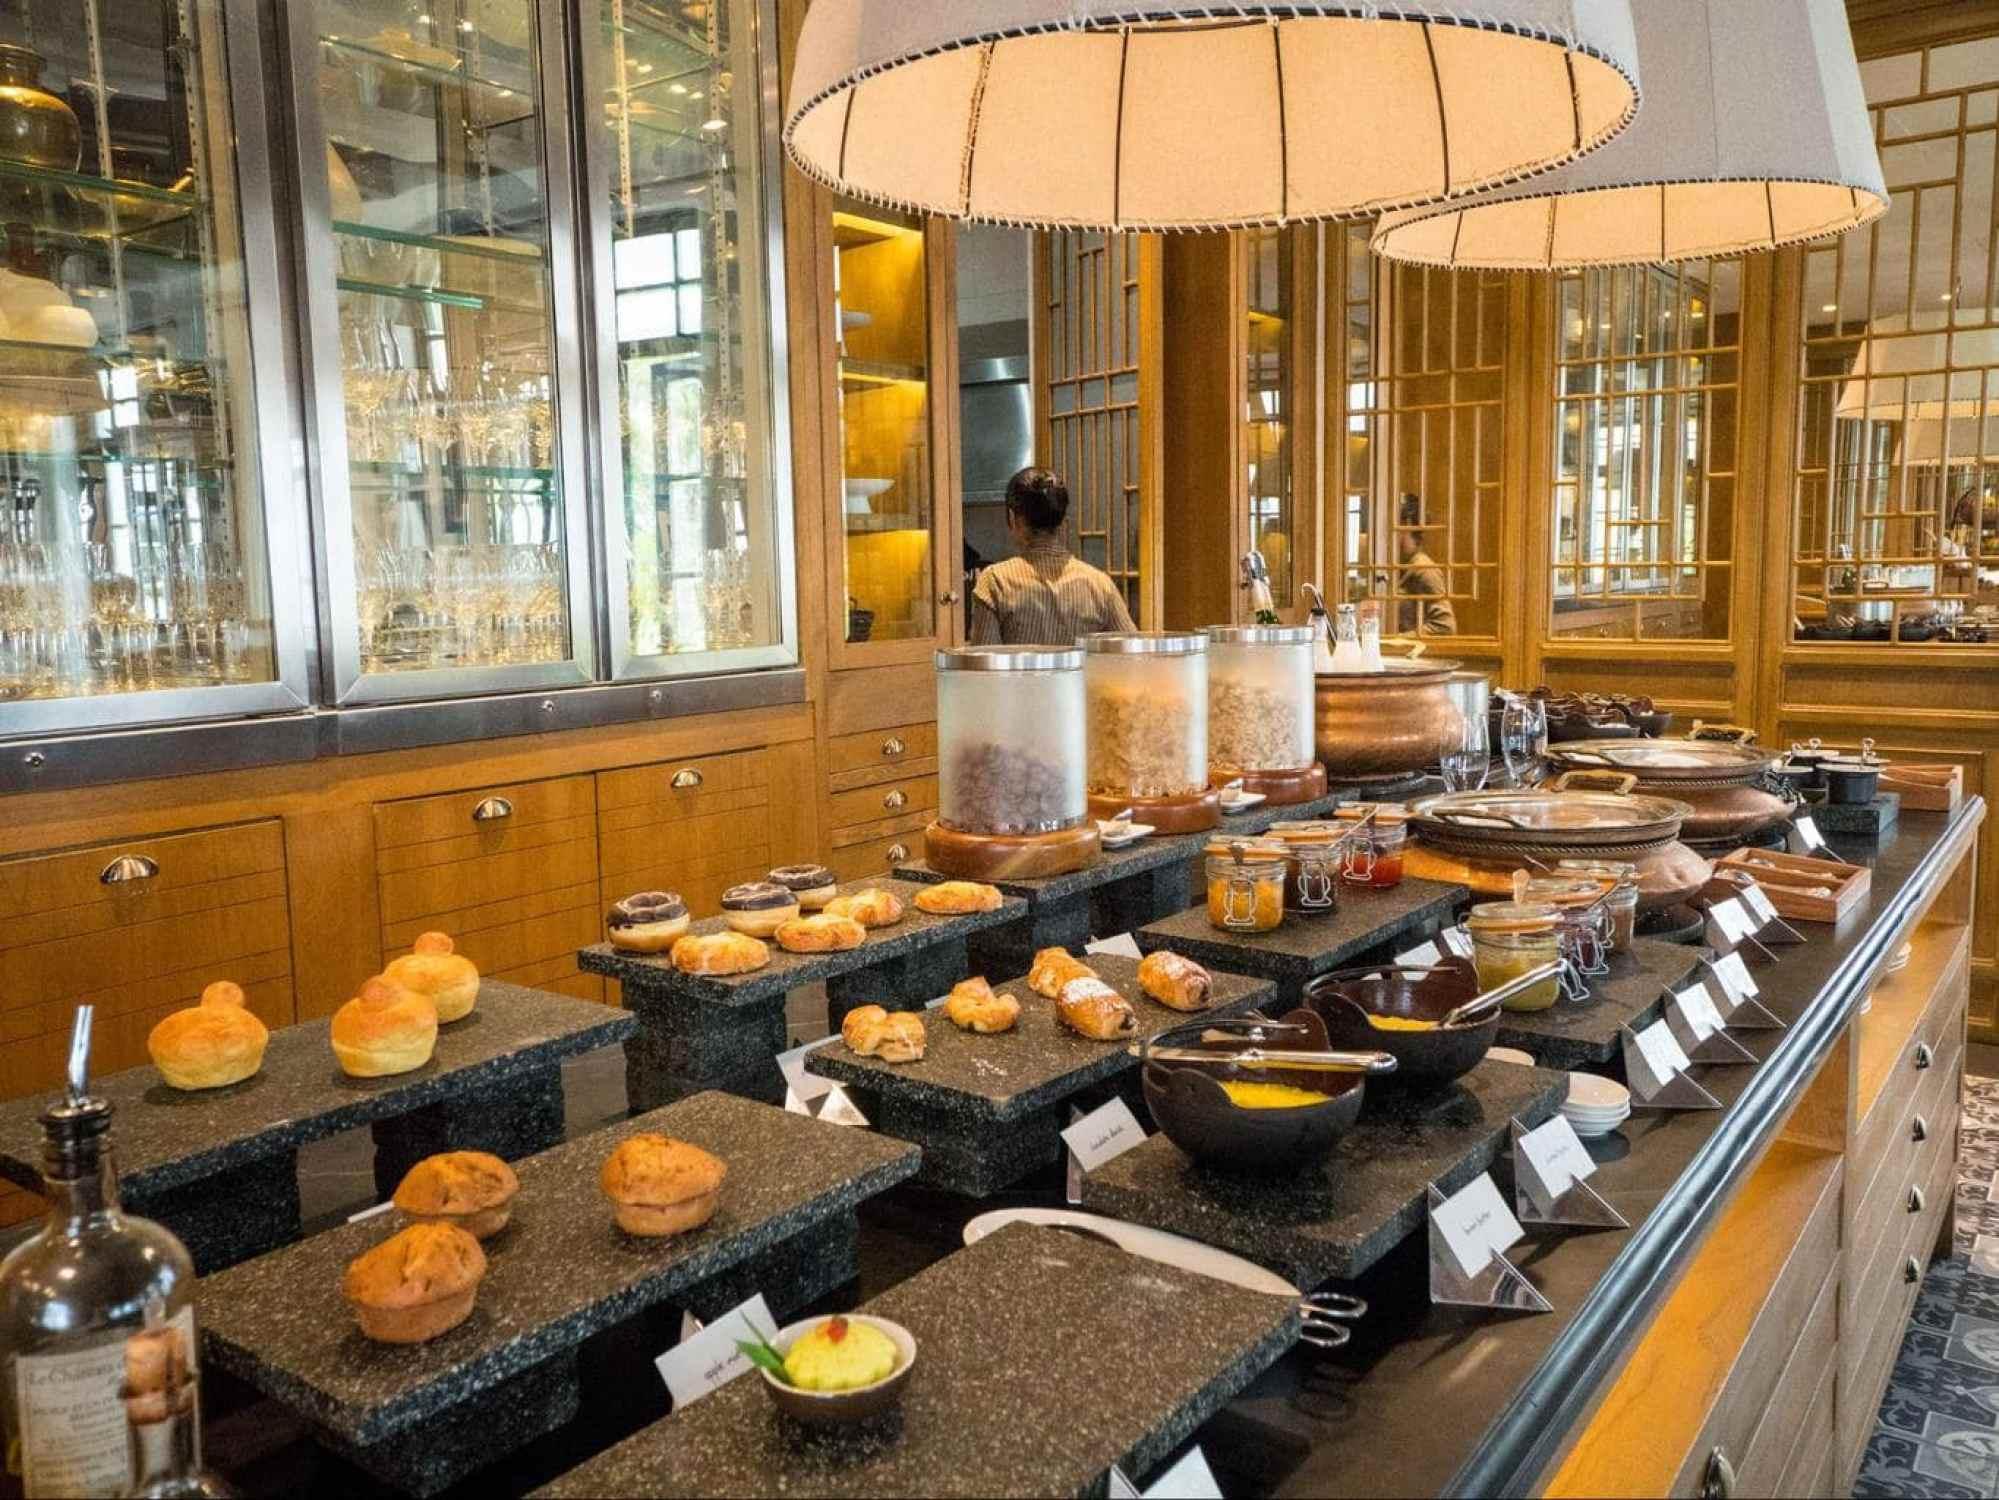 The breakfast buffet at The Sanchaya